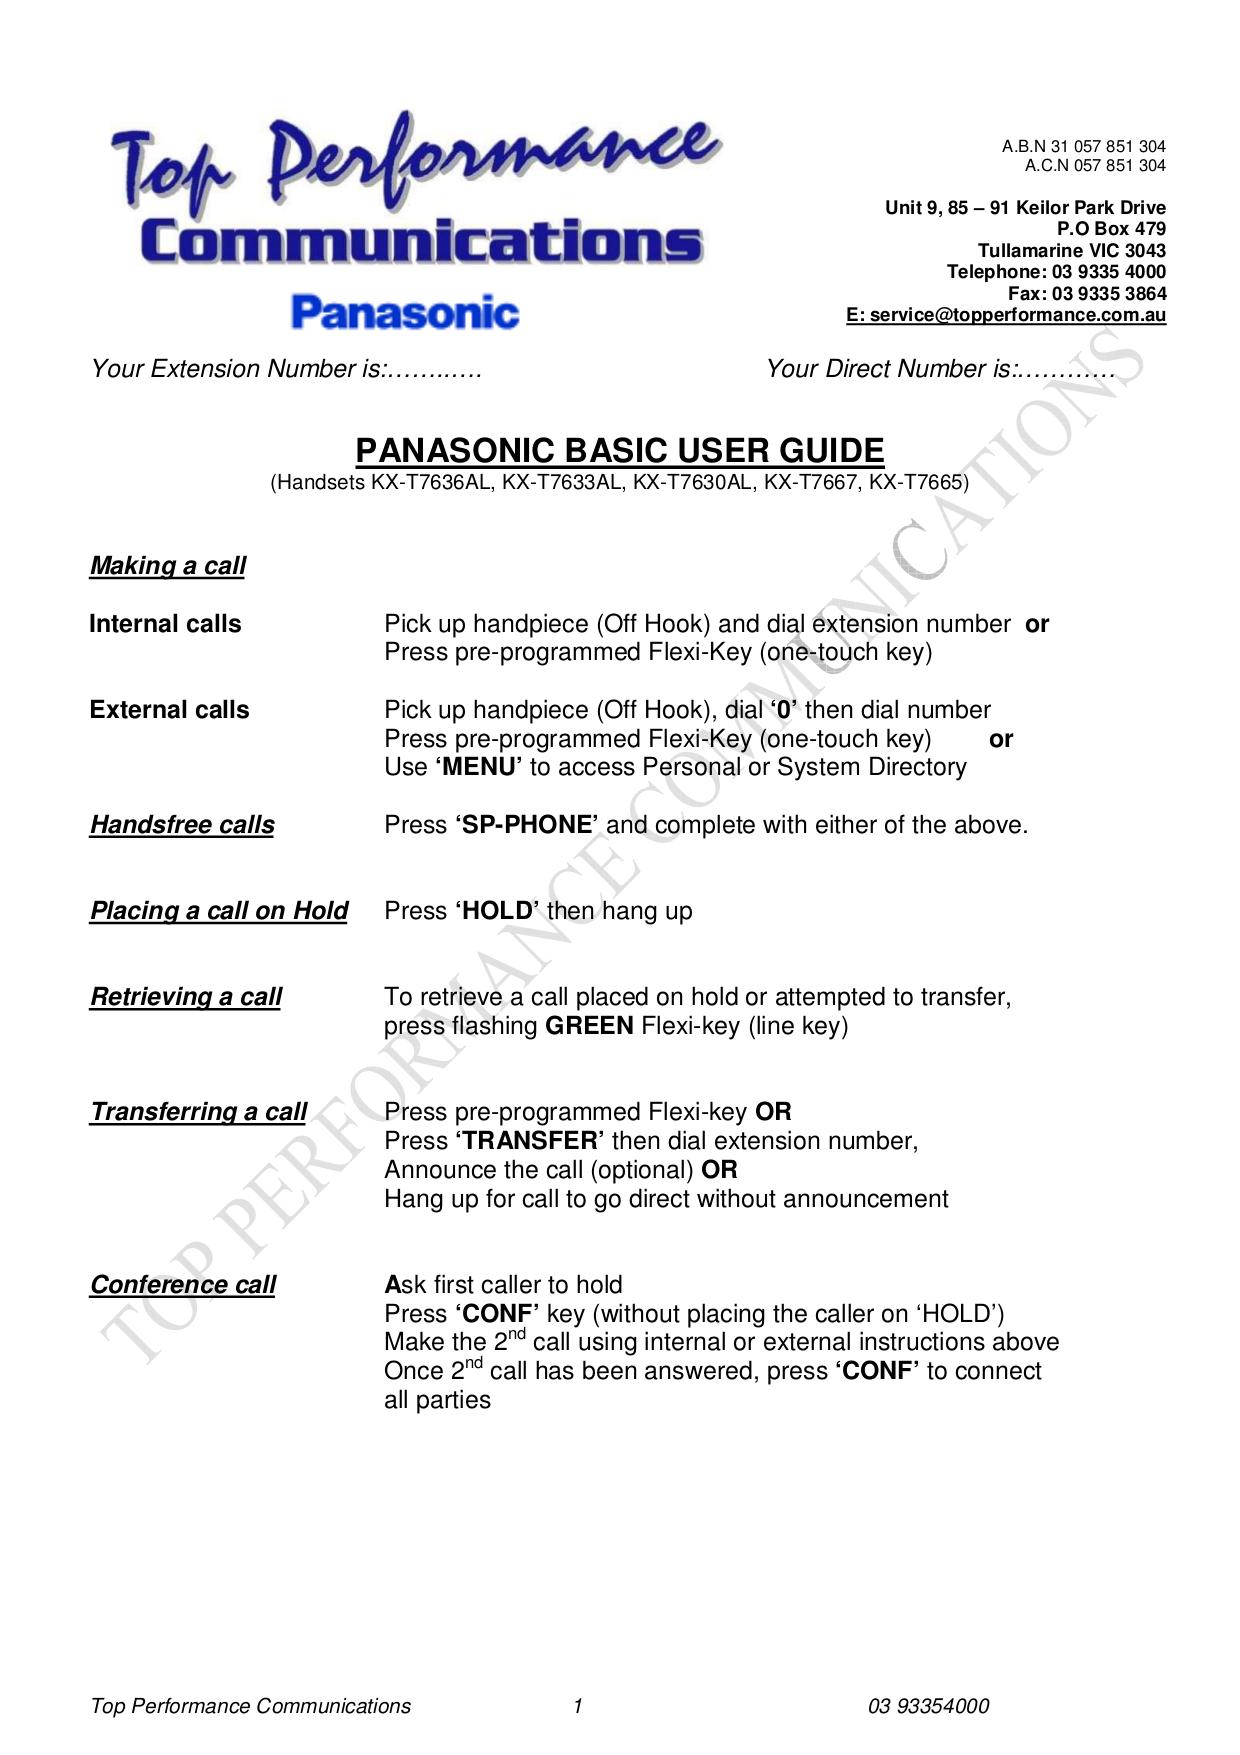 download free pdf for panasonic kx t7667 telephone manual rh umlib com Panasonic Kx Phone Manual Tgf350 Panasonic Kx Phone Manual Tgf350